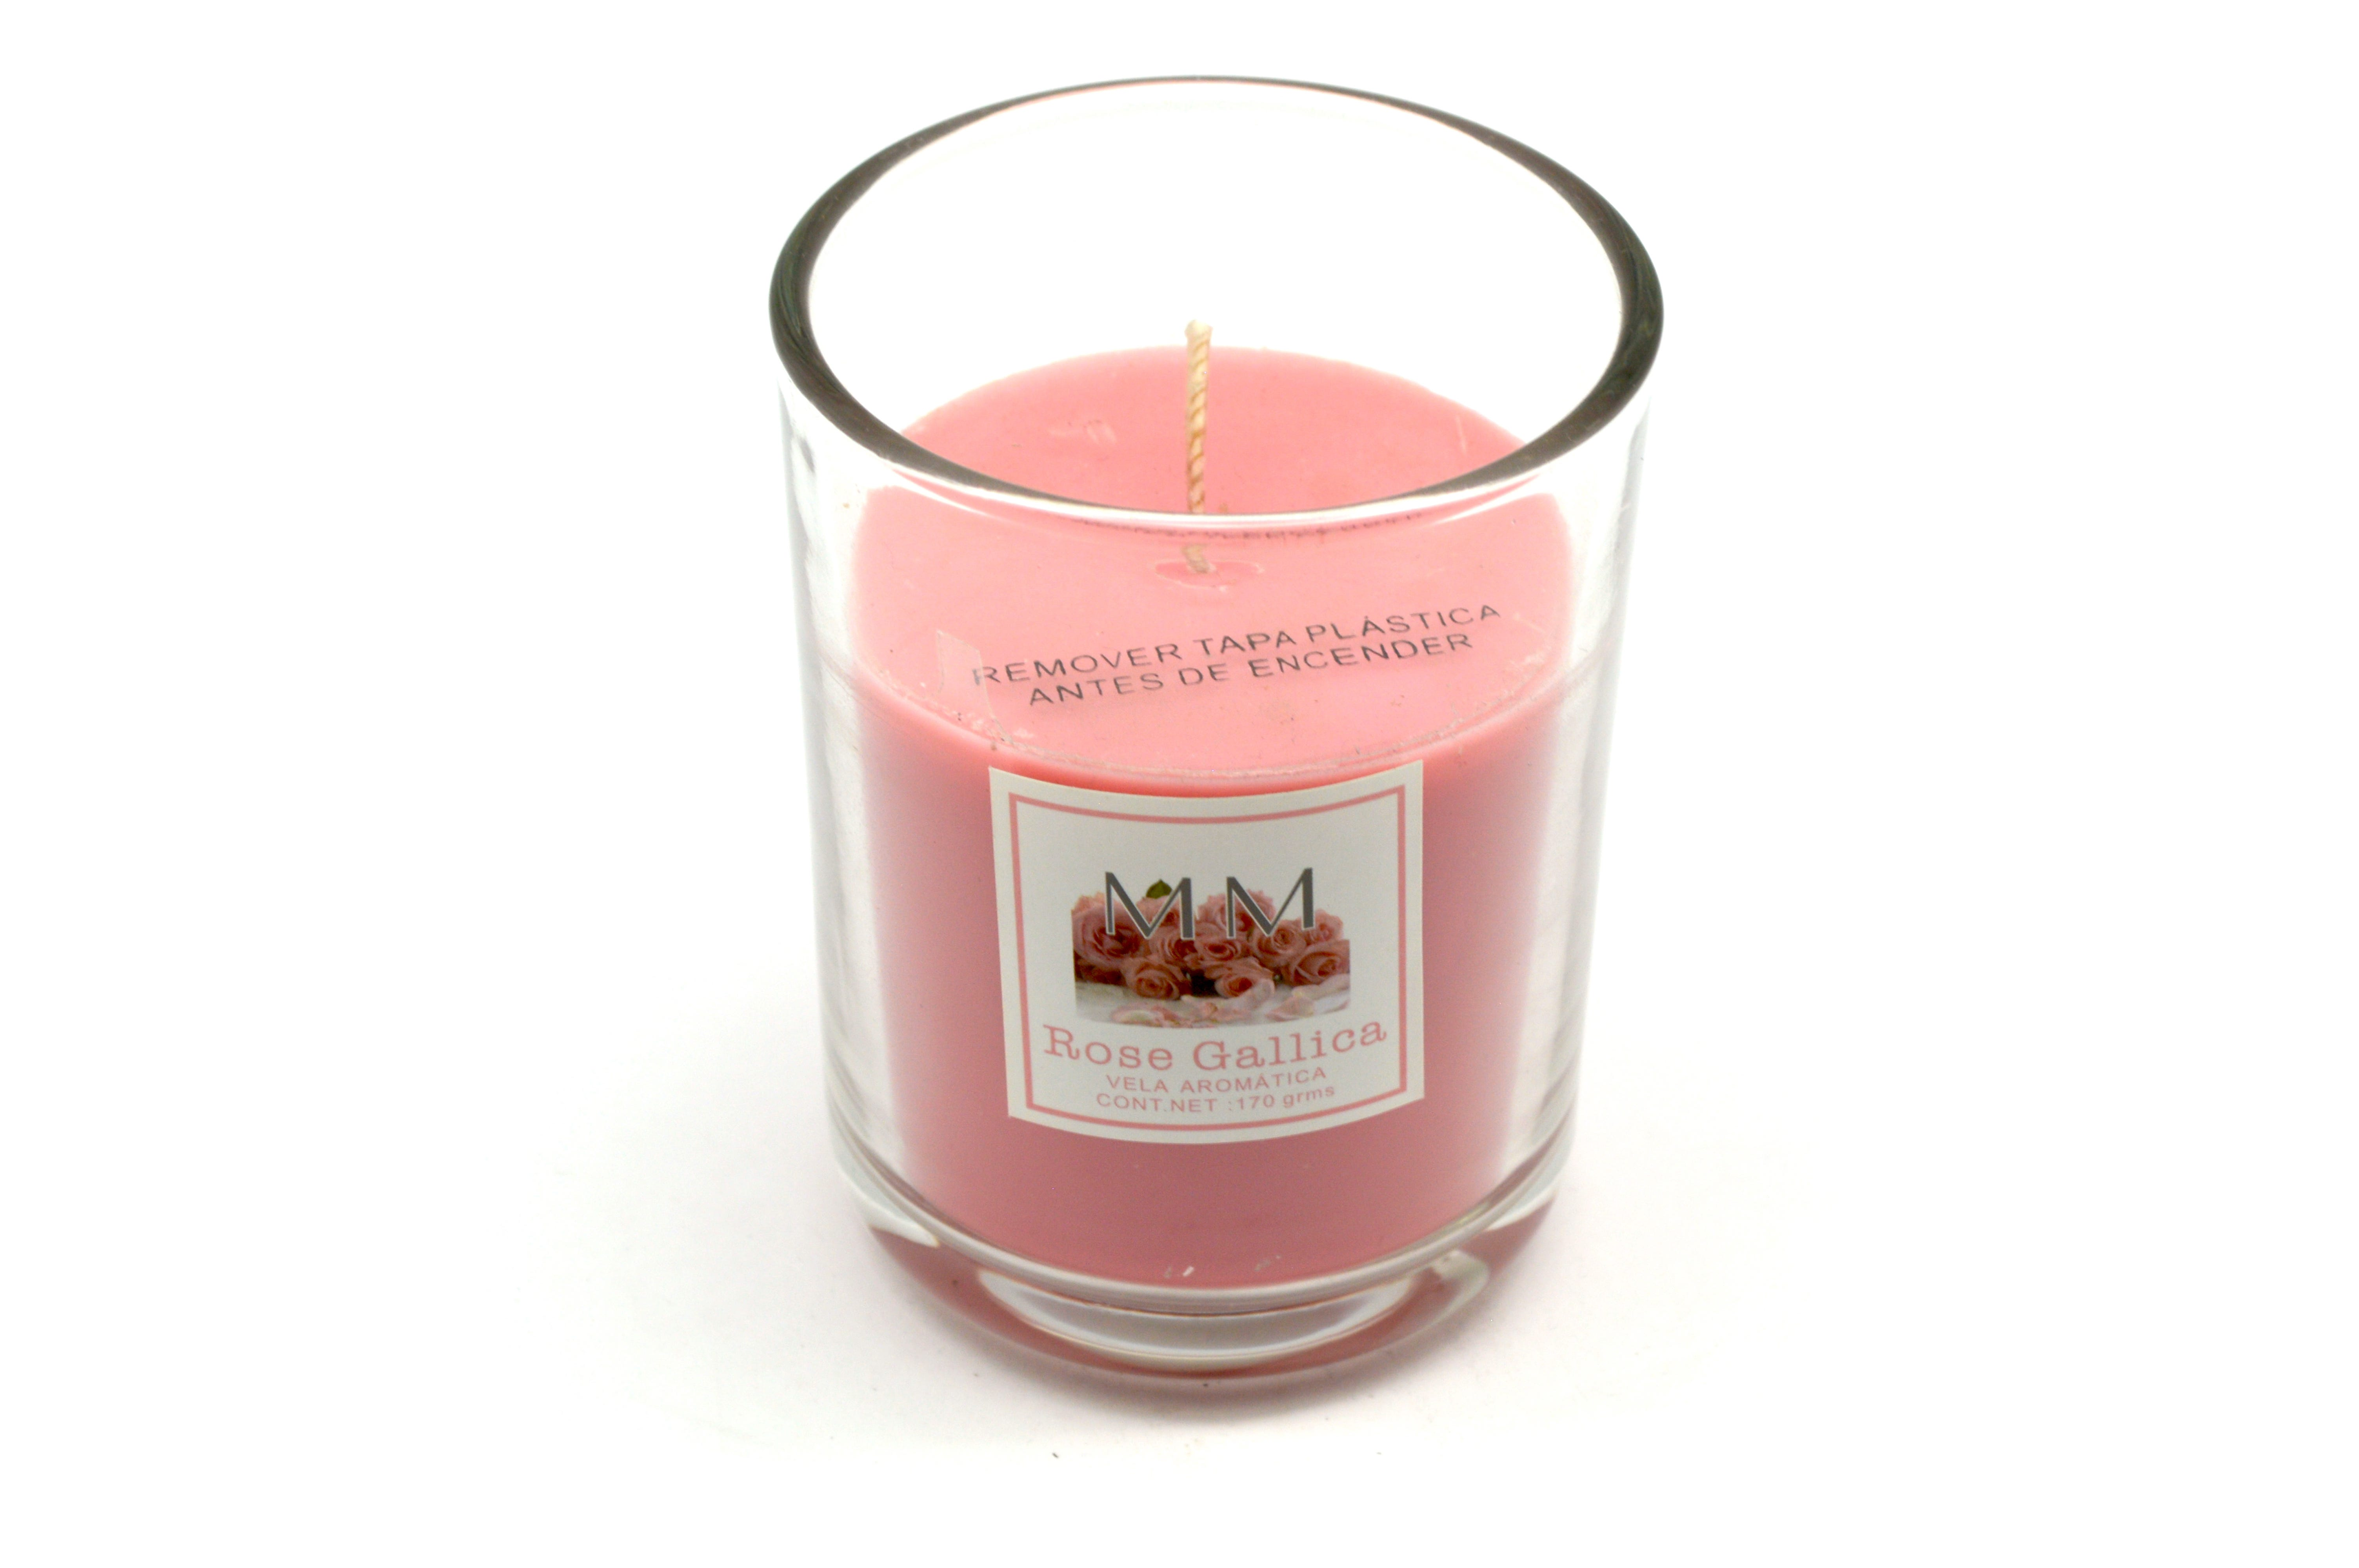 Vela en vaso MM aroma rosa gallica, 170 g